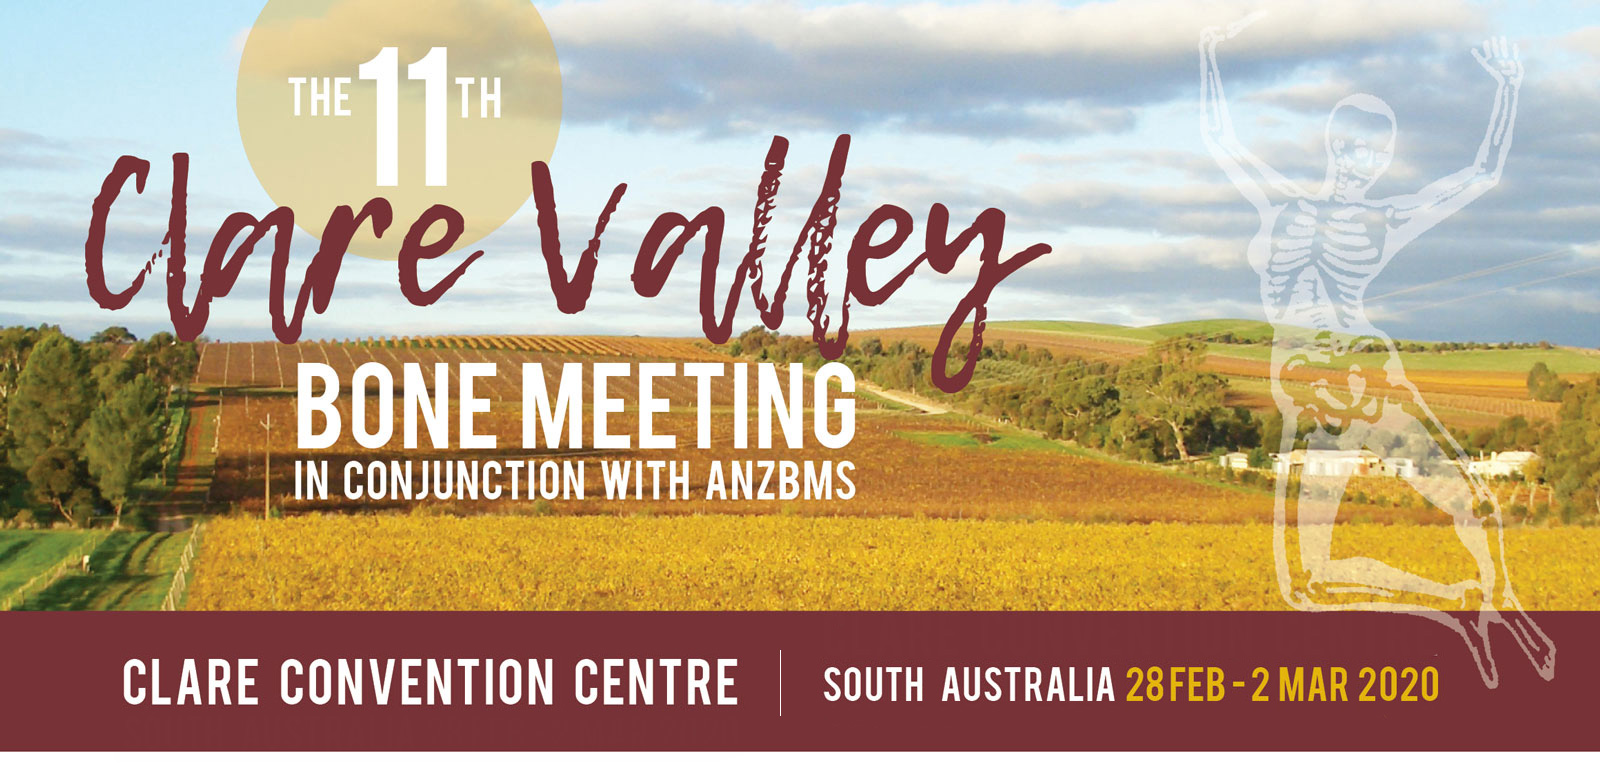 clare-valley-bone-meeting-home-banner-3.jpg